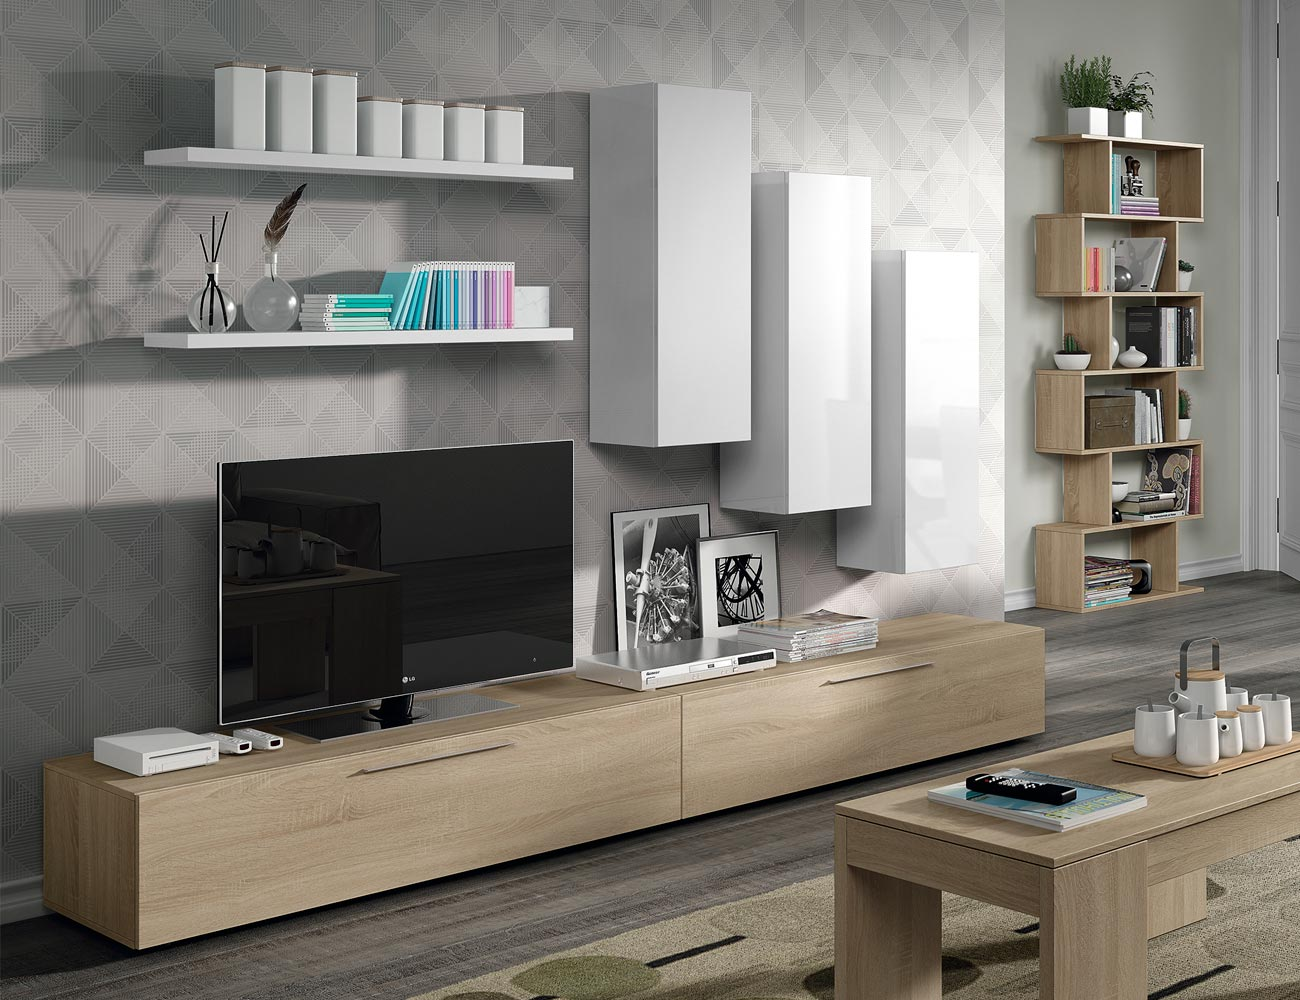 Mueble salon moderno roble blanco